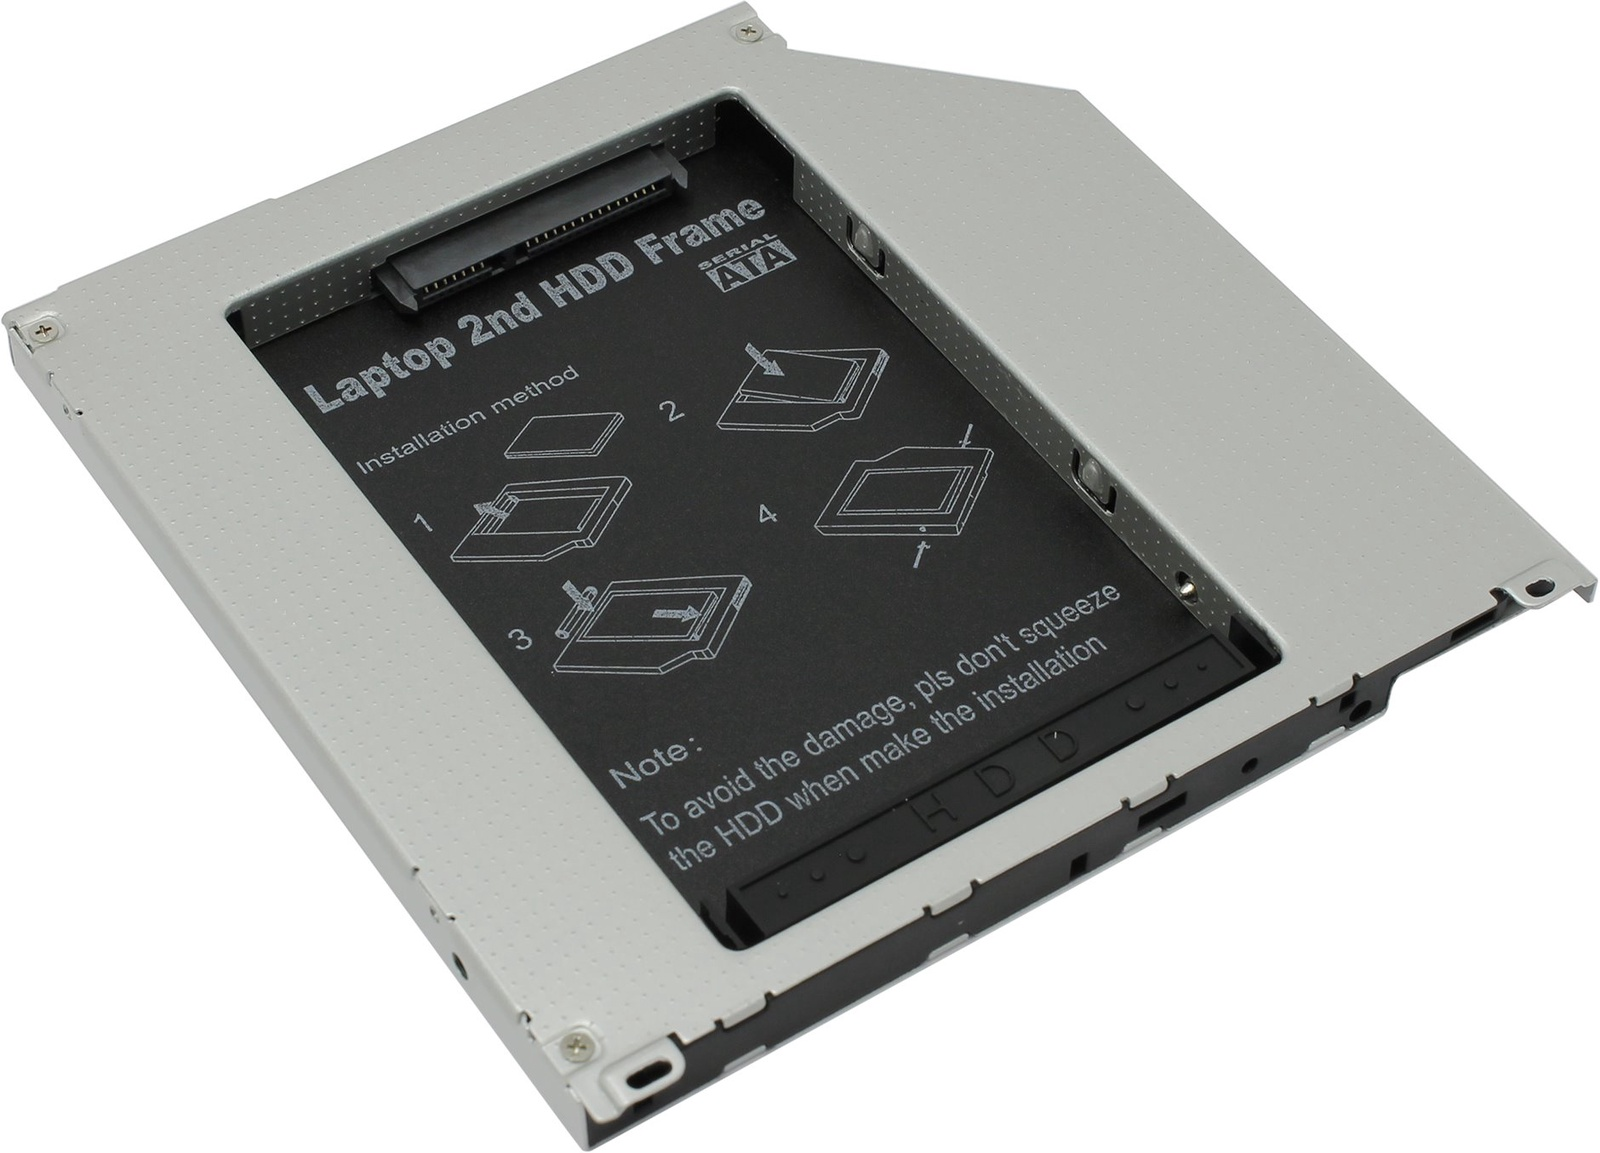 SS95U, Адаптер оптибей Espada SATA/miniSATA (SlimSATA) для подключения HDD/SSD 2,5дюйма к ноутбуку вместо DVD переходник minisata sata